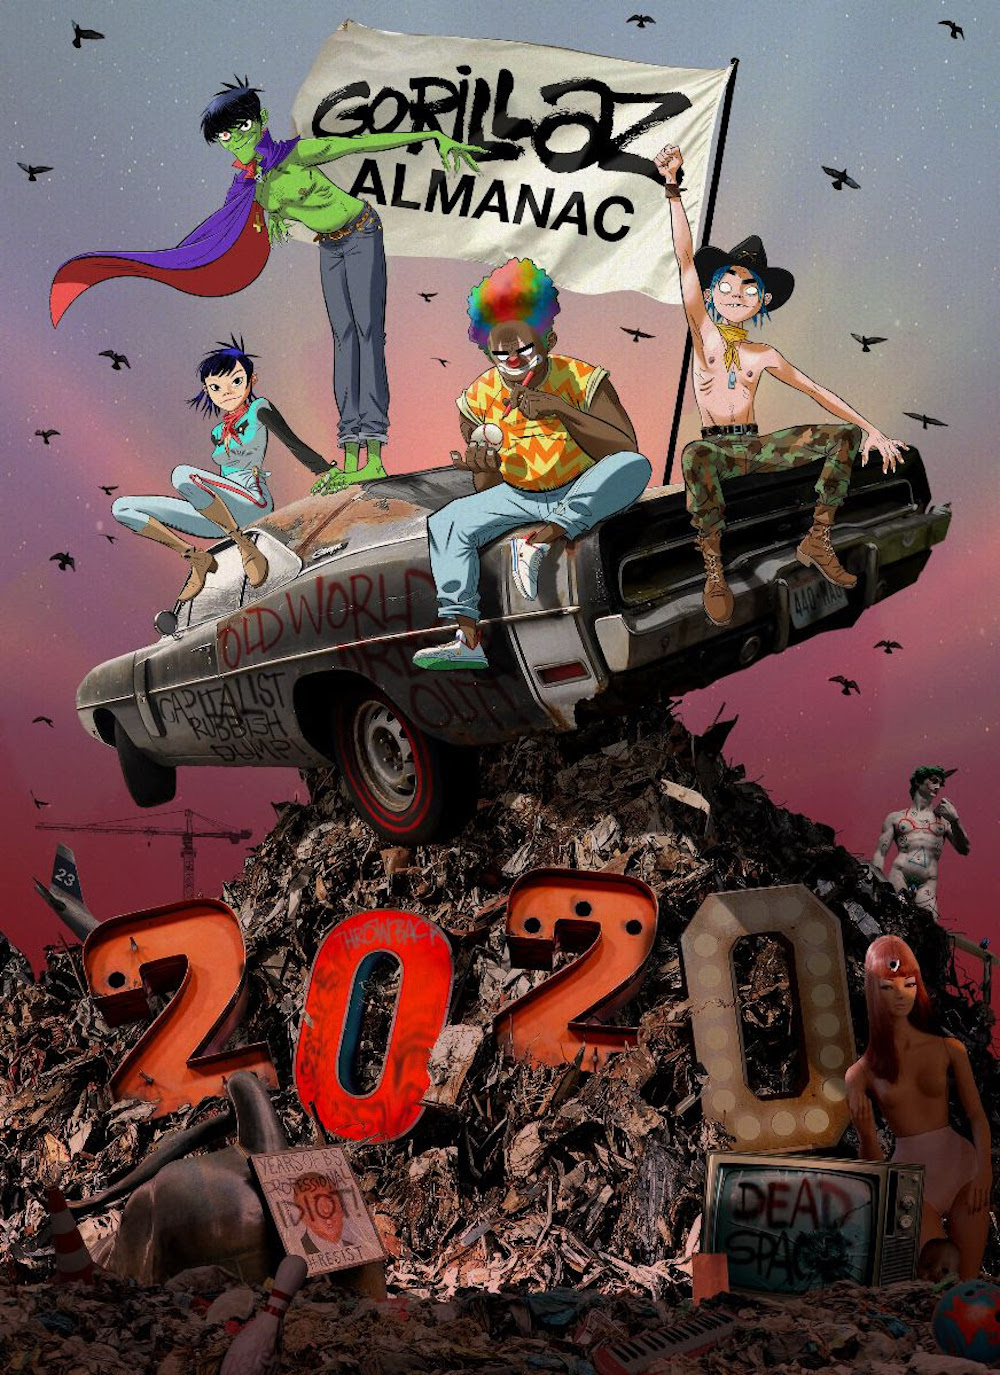 gorillaz almanac book 20 years Gorillaz Celebrate 20 Year Visual History with New Almanac